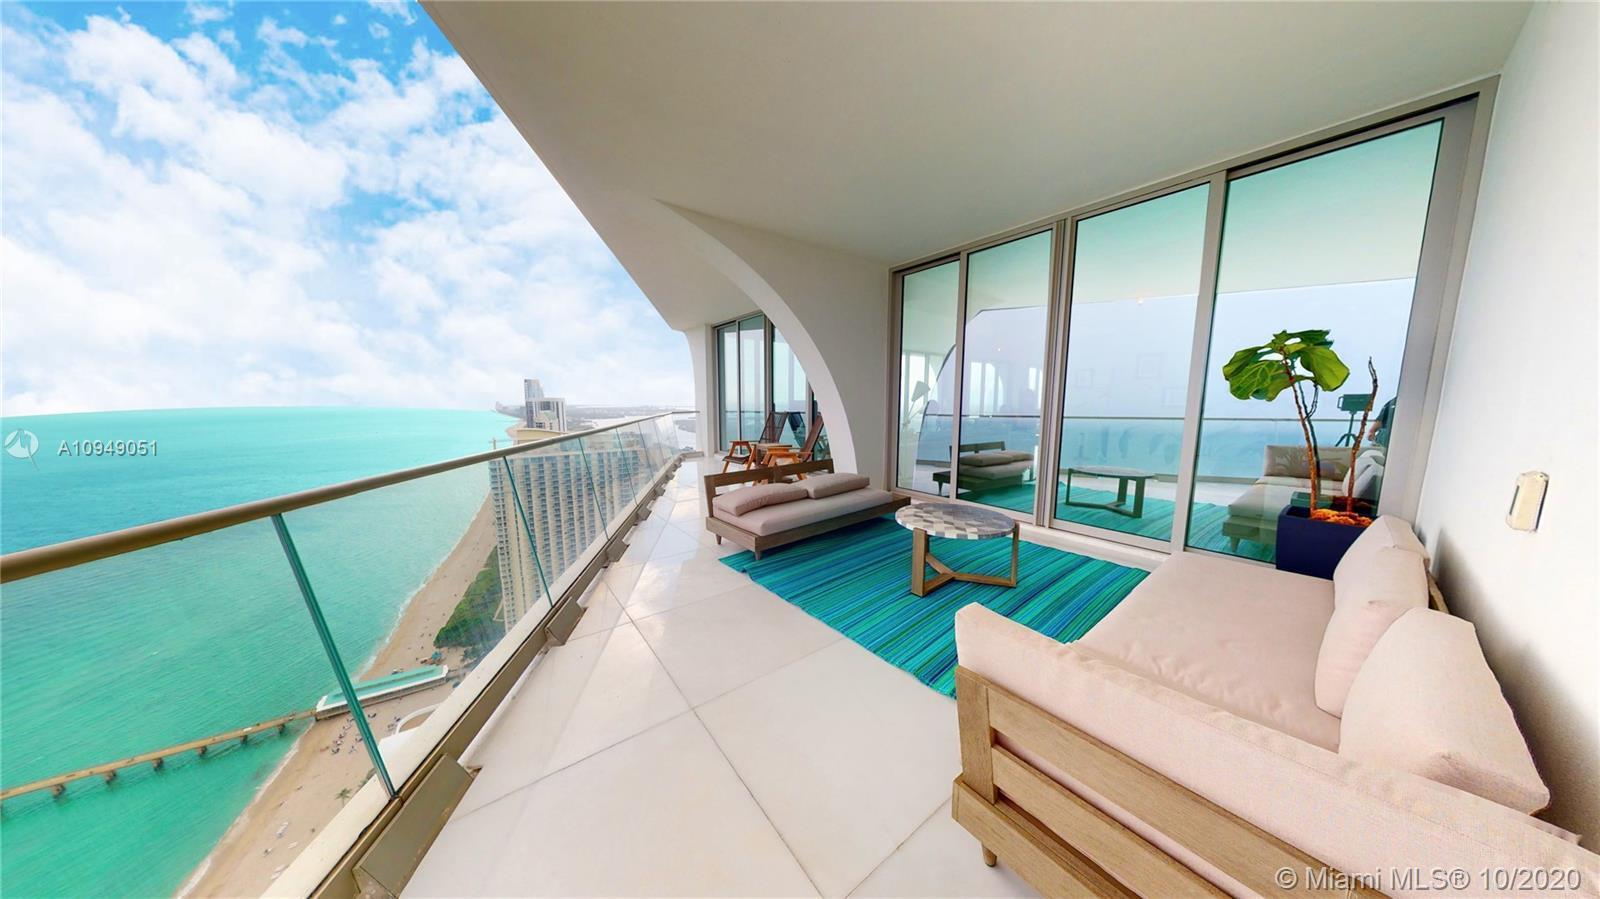 Spectacular corner residence in Award-Winning Miami Oceanfront Residences by Pritzker-Prize winning